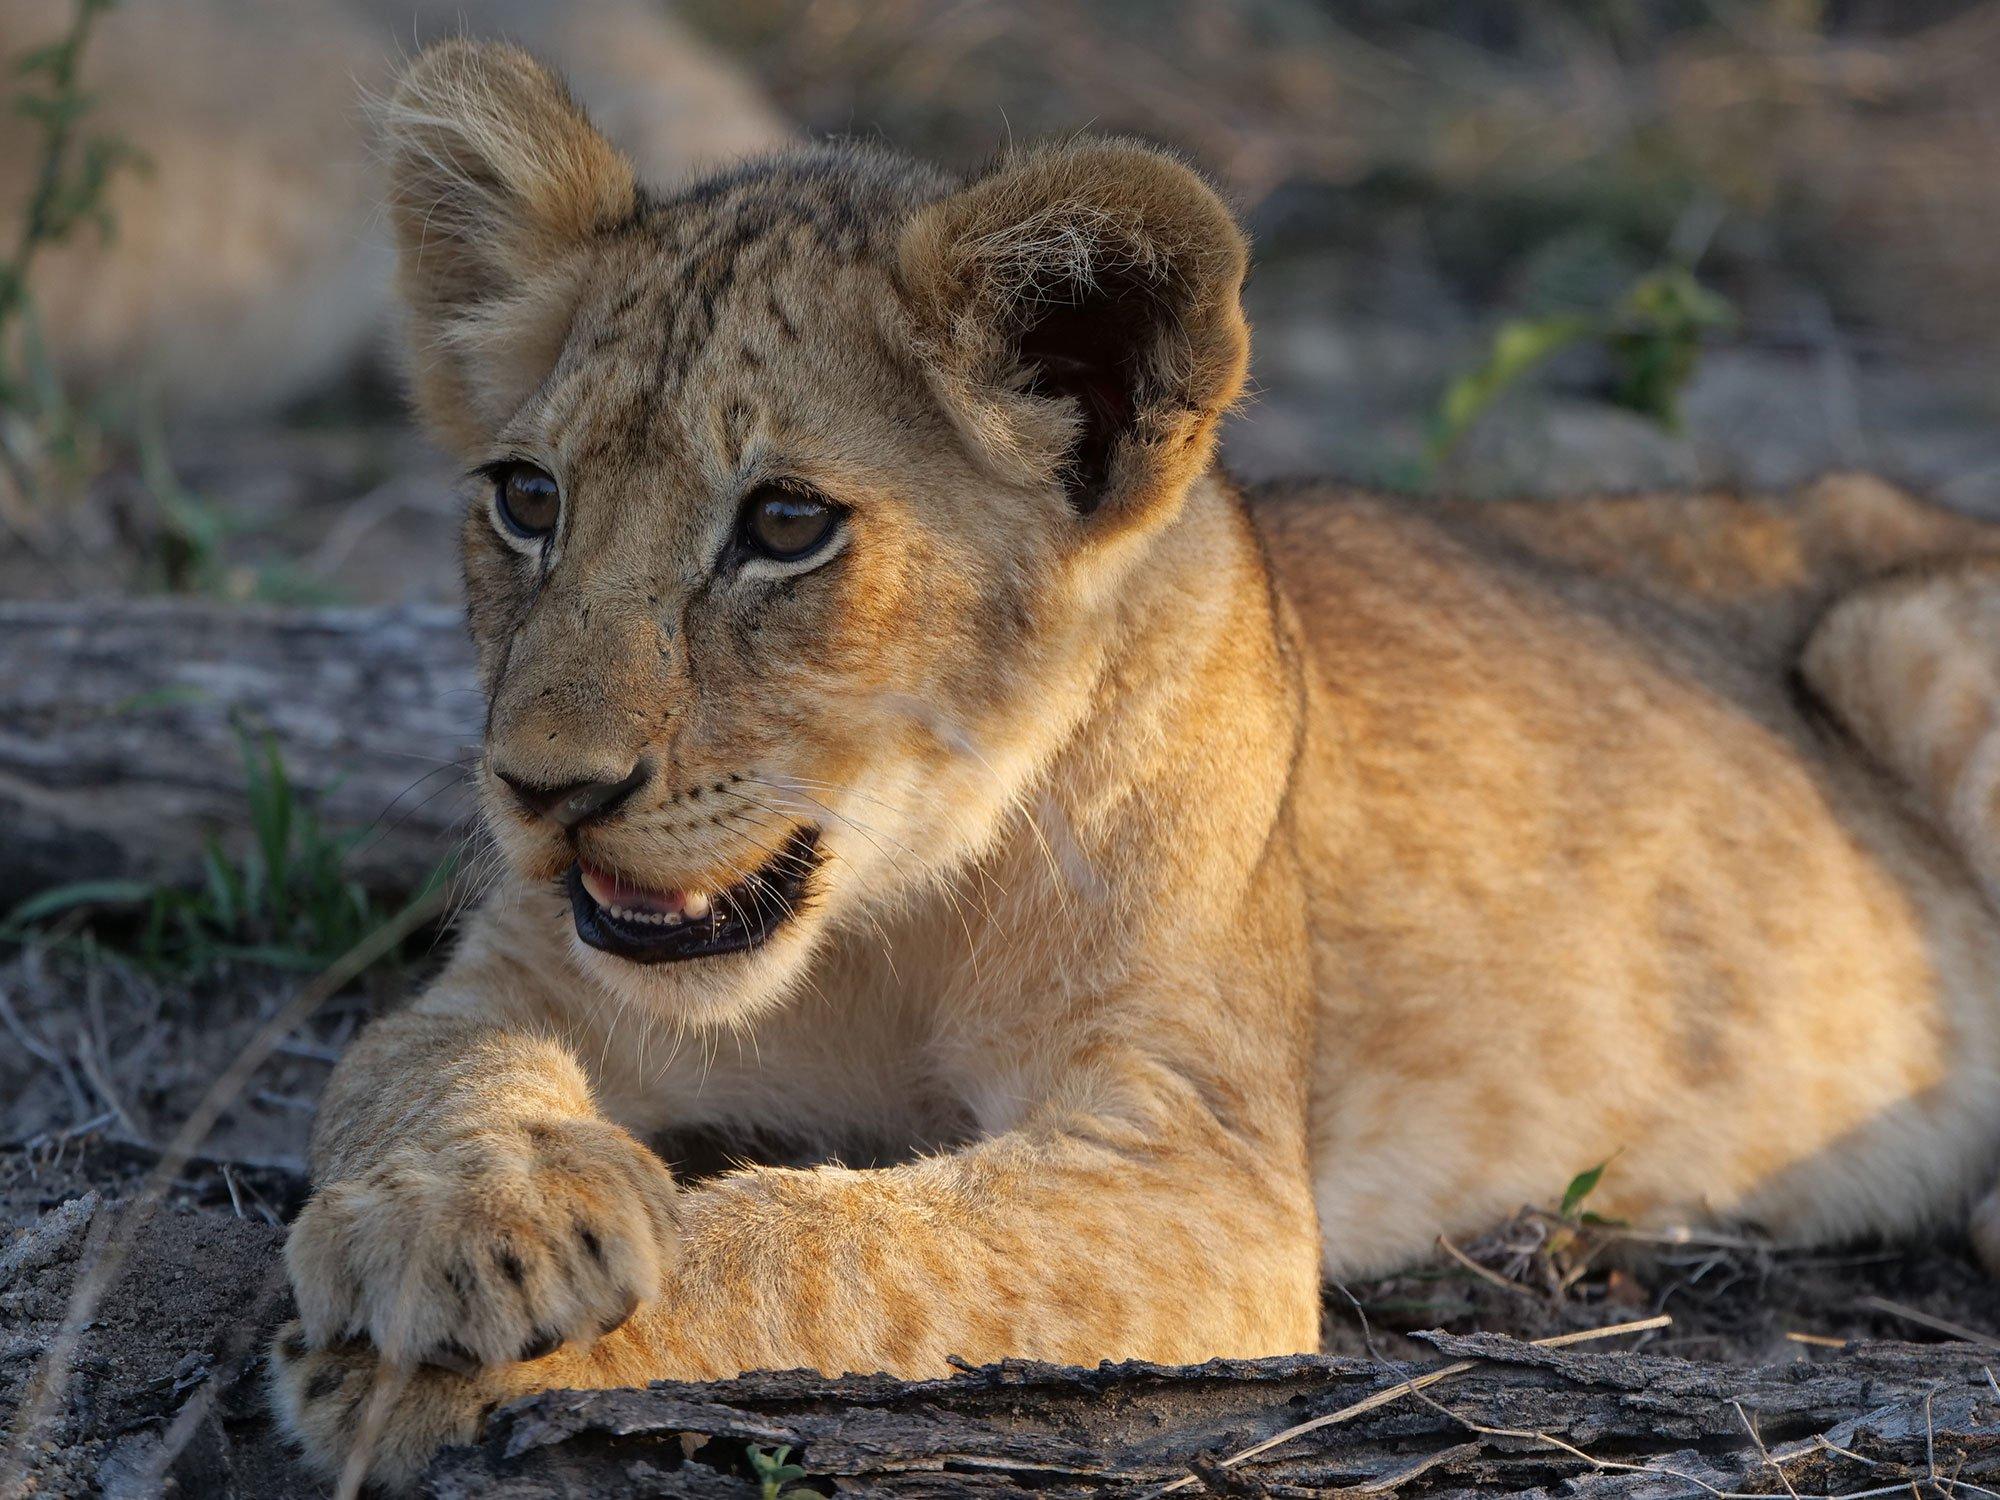 South Africa Safari Photography - | Cameralabs